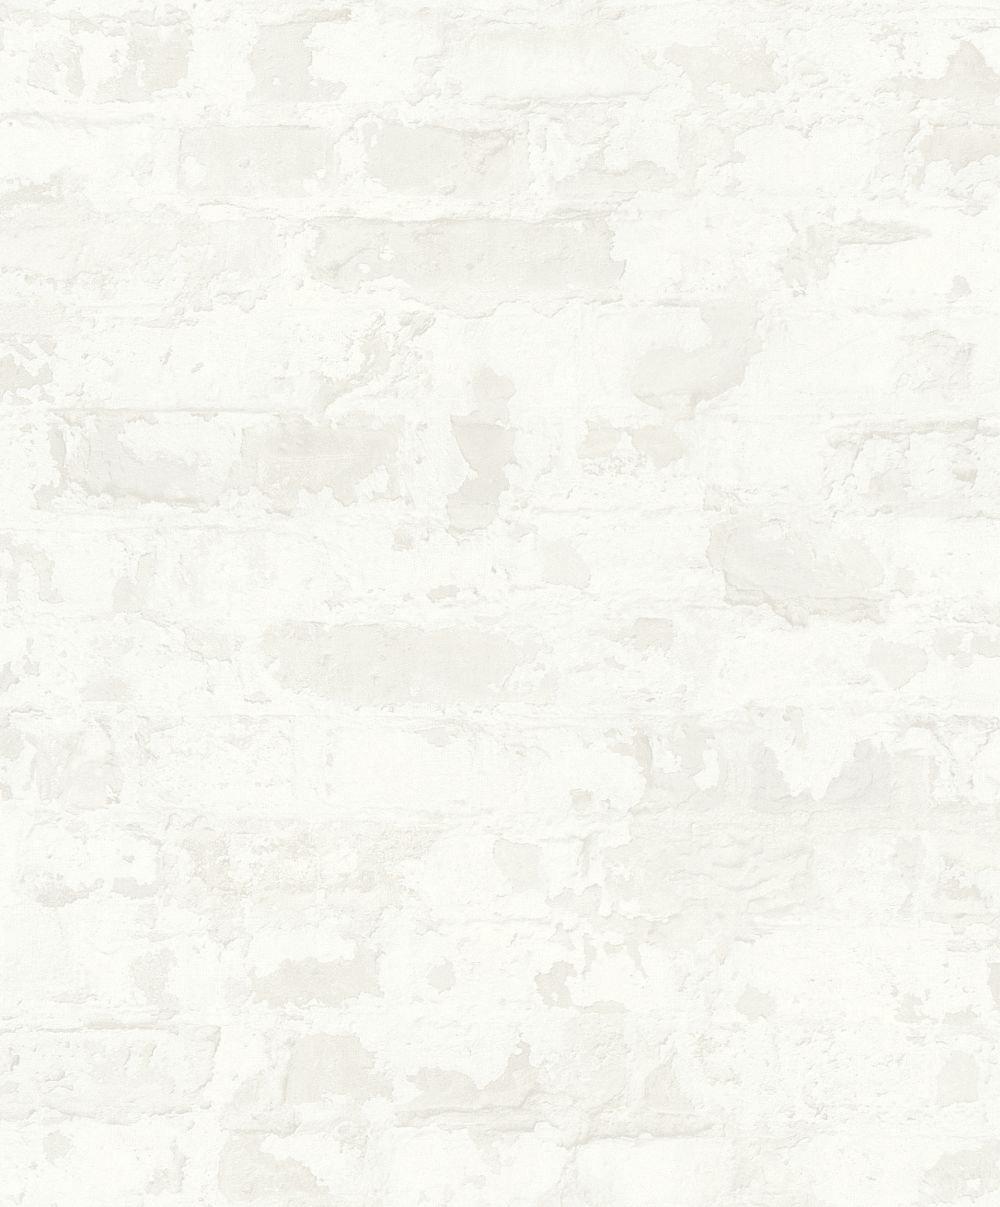 Metropolitan Stories Distressed Plaster White Wallpaper - Product code: 36929-4